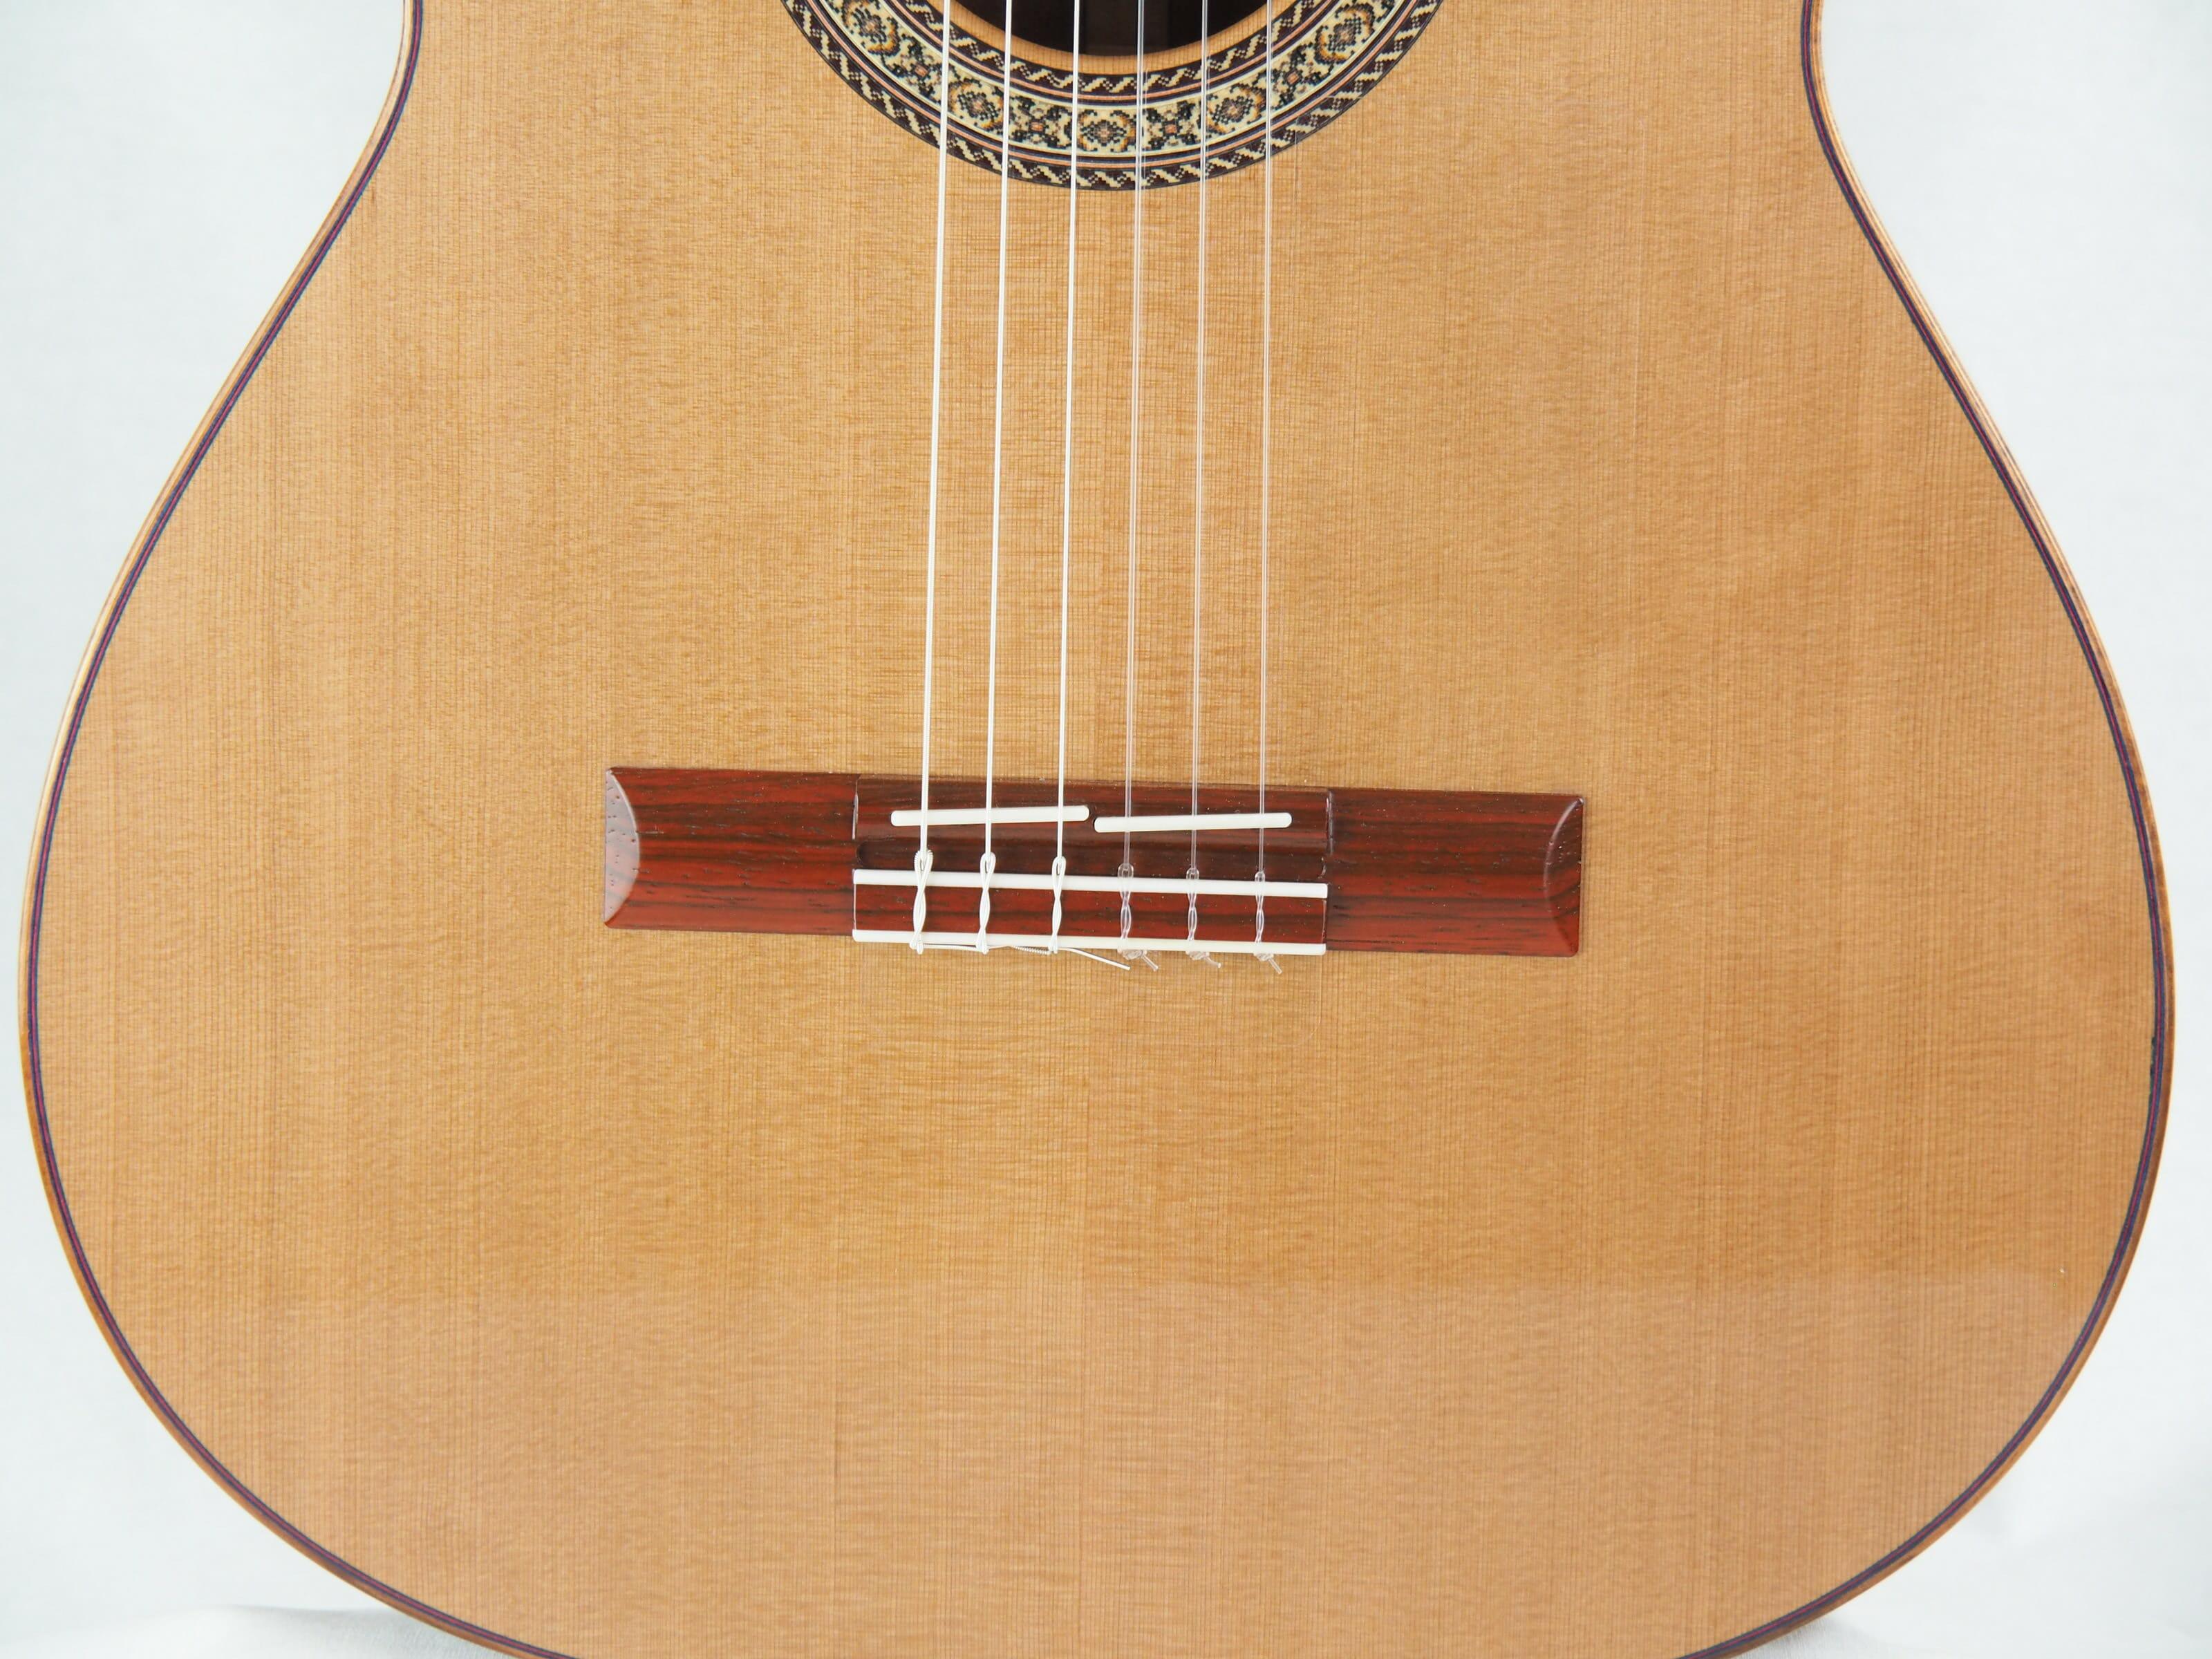 Guitare classique luthier John Price No 382 19PRI382-10